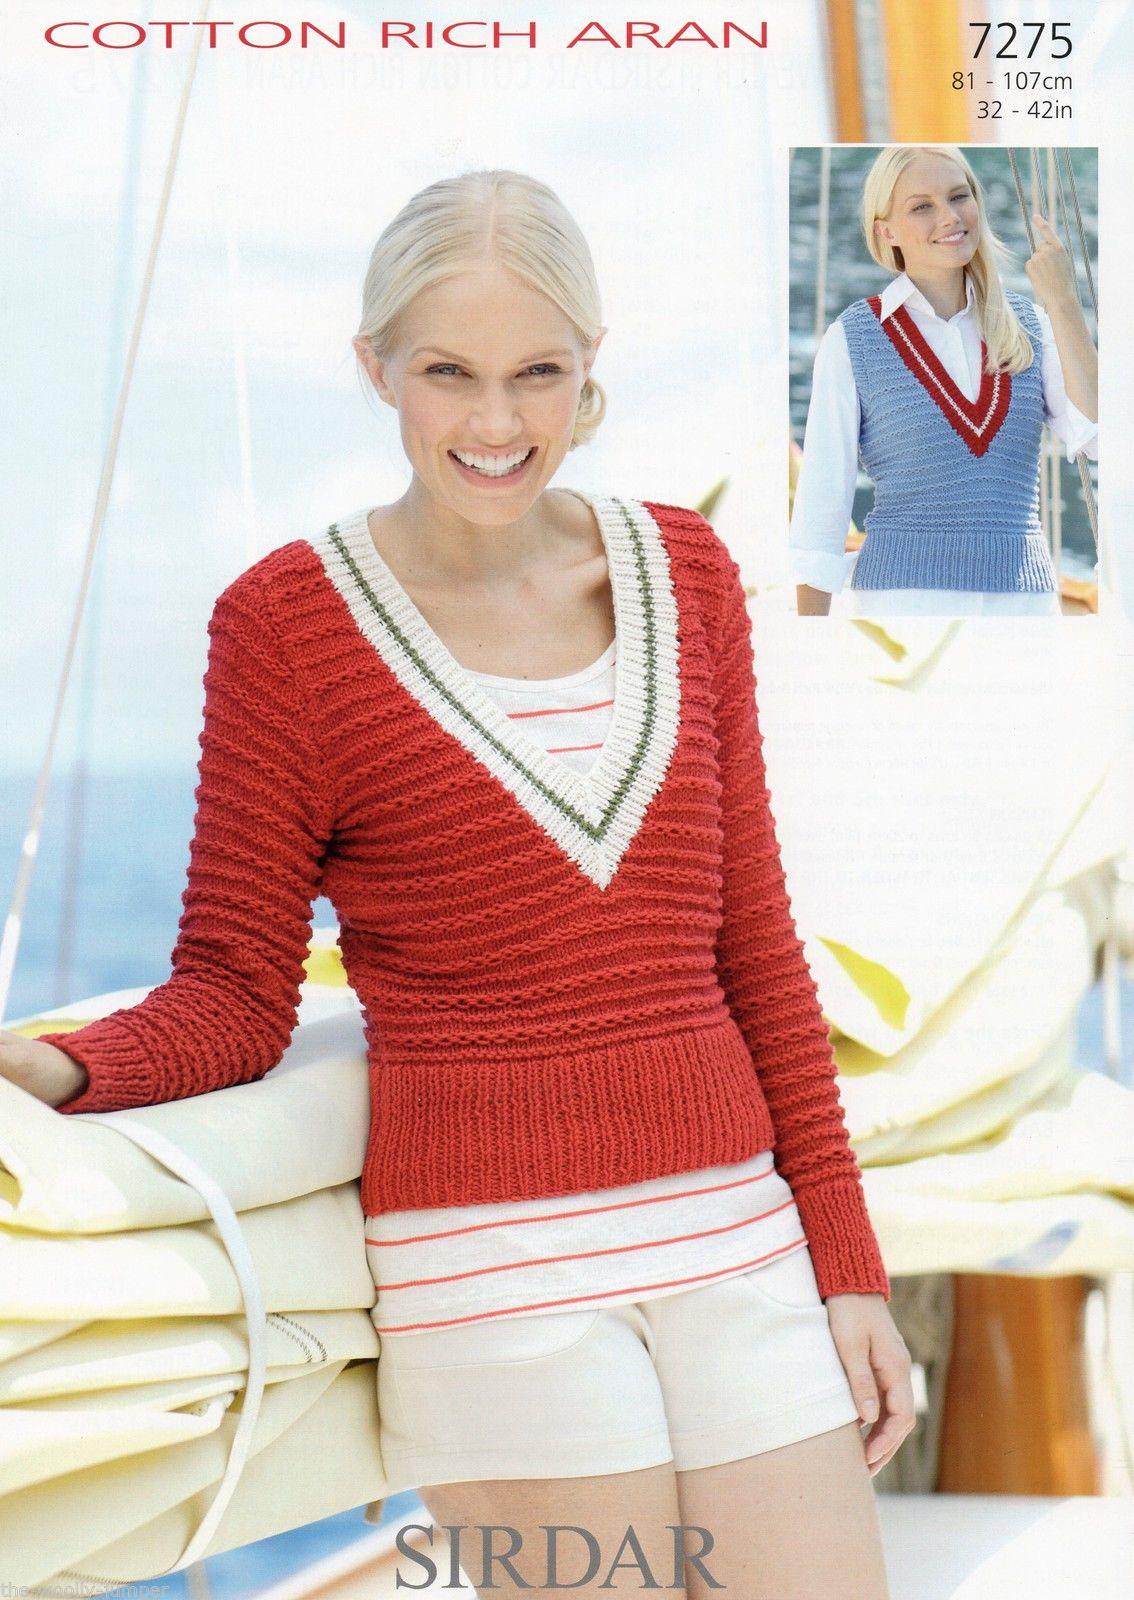 7275 Sirdar Cotton Rich Aran Sweater Tank Top Knitting Pattern